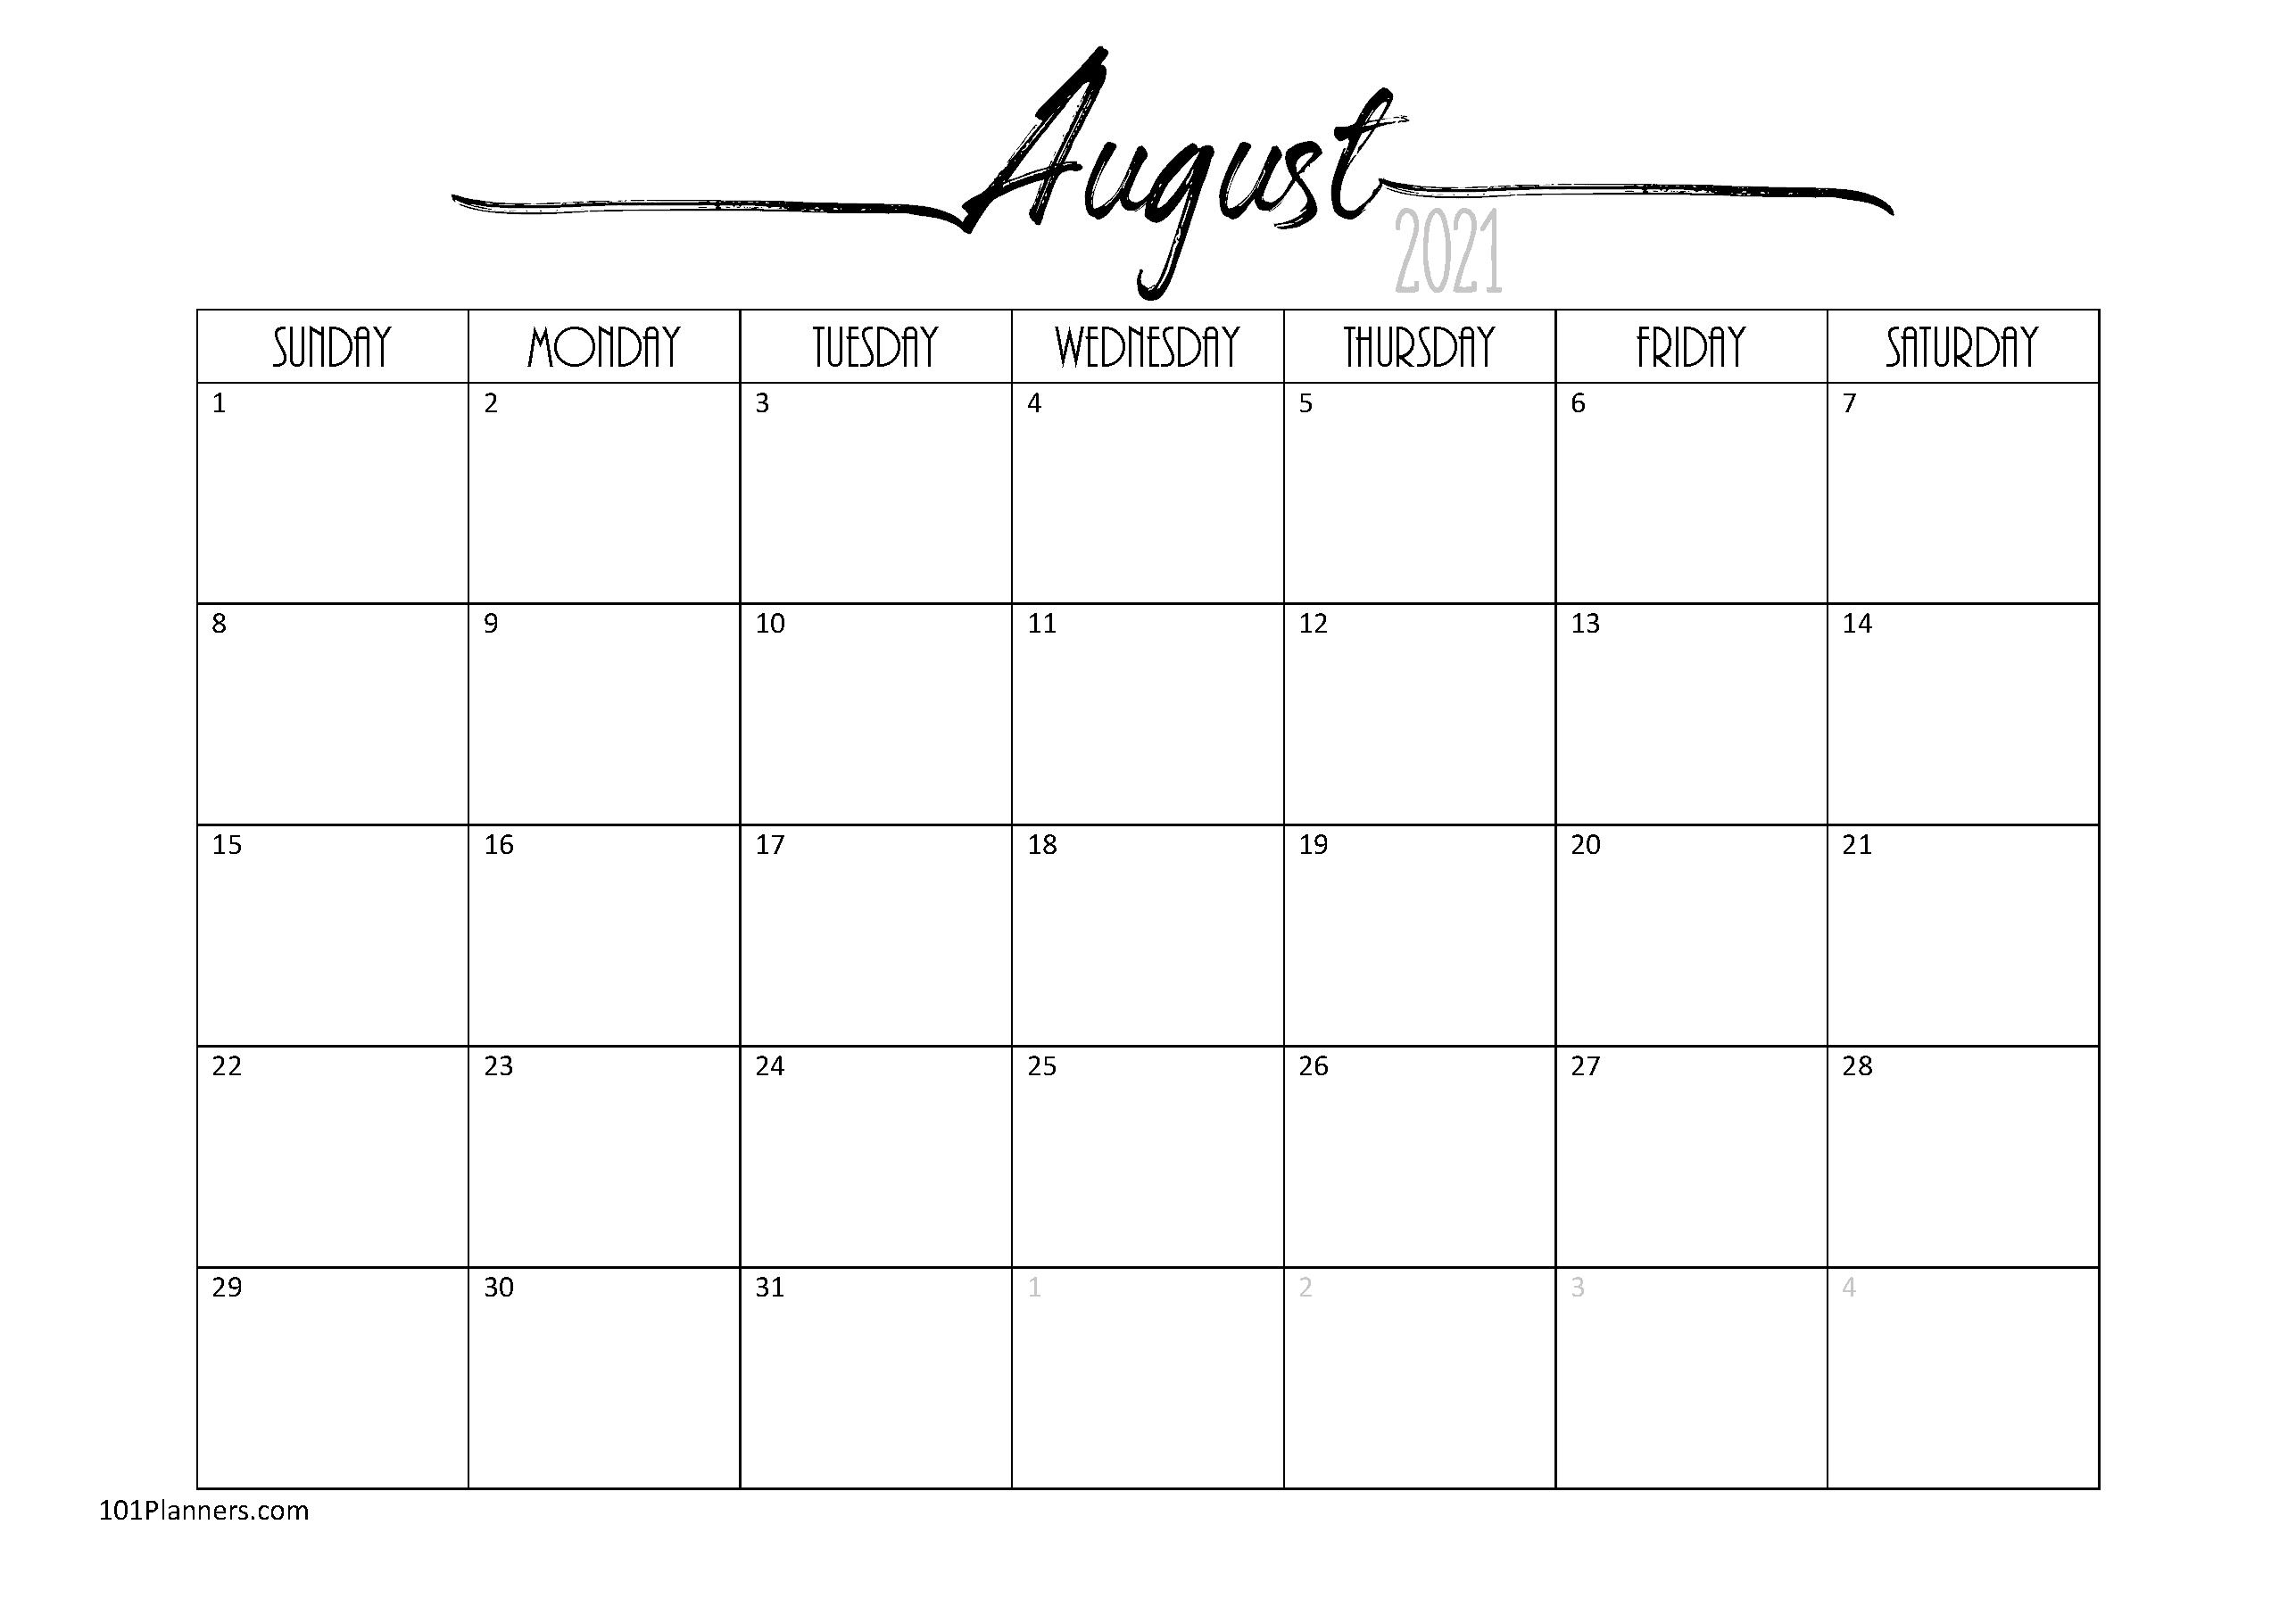 Free Blank Calendar Template from www.101planners.com